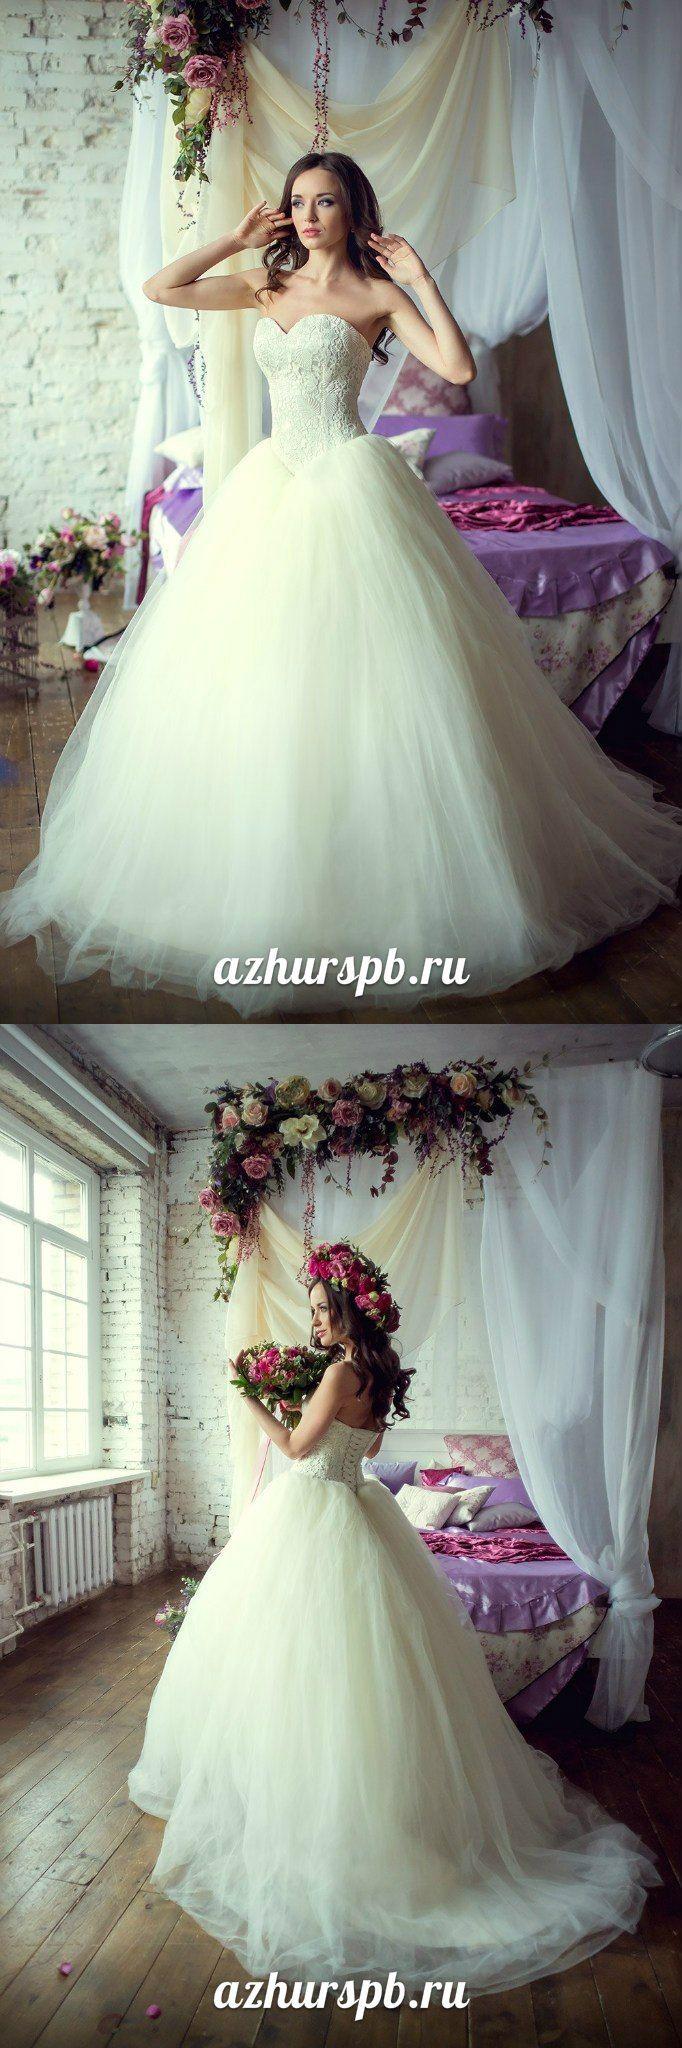 wedding dress pink flowers bride wreath ballgown lace